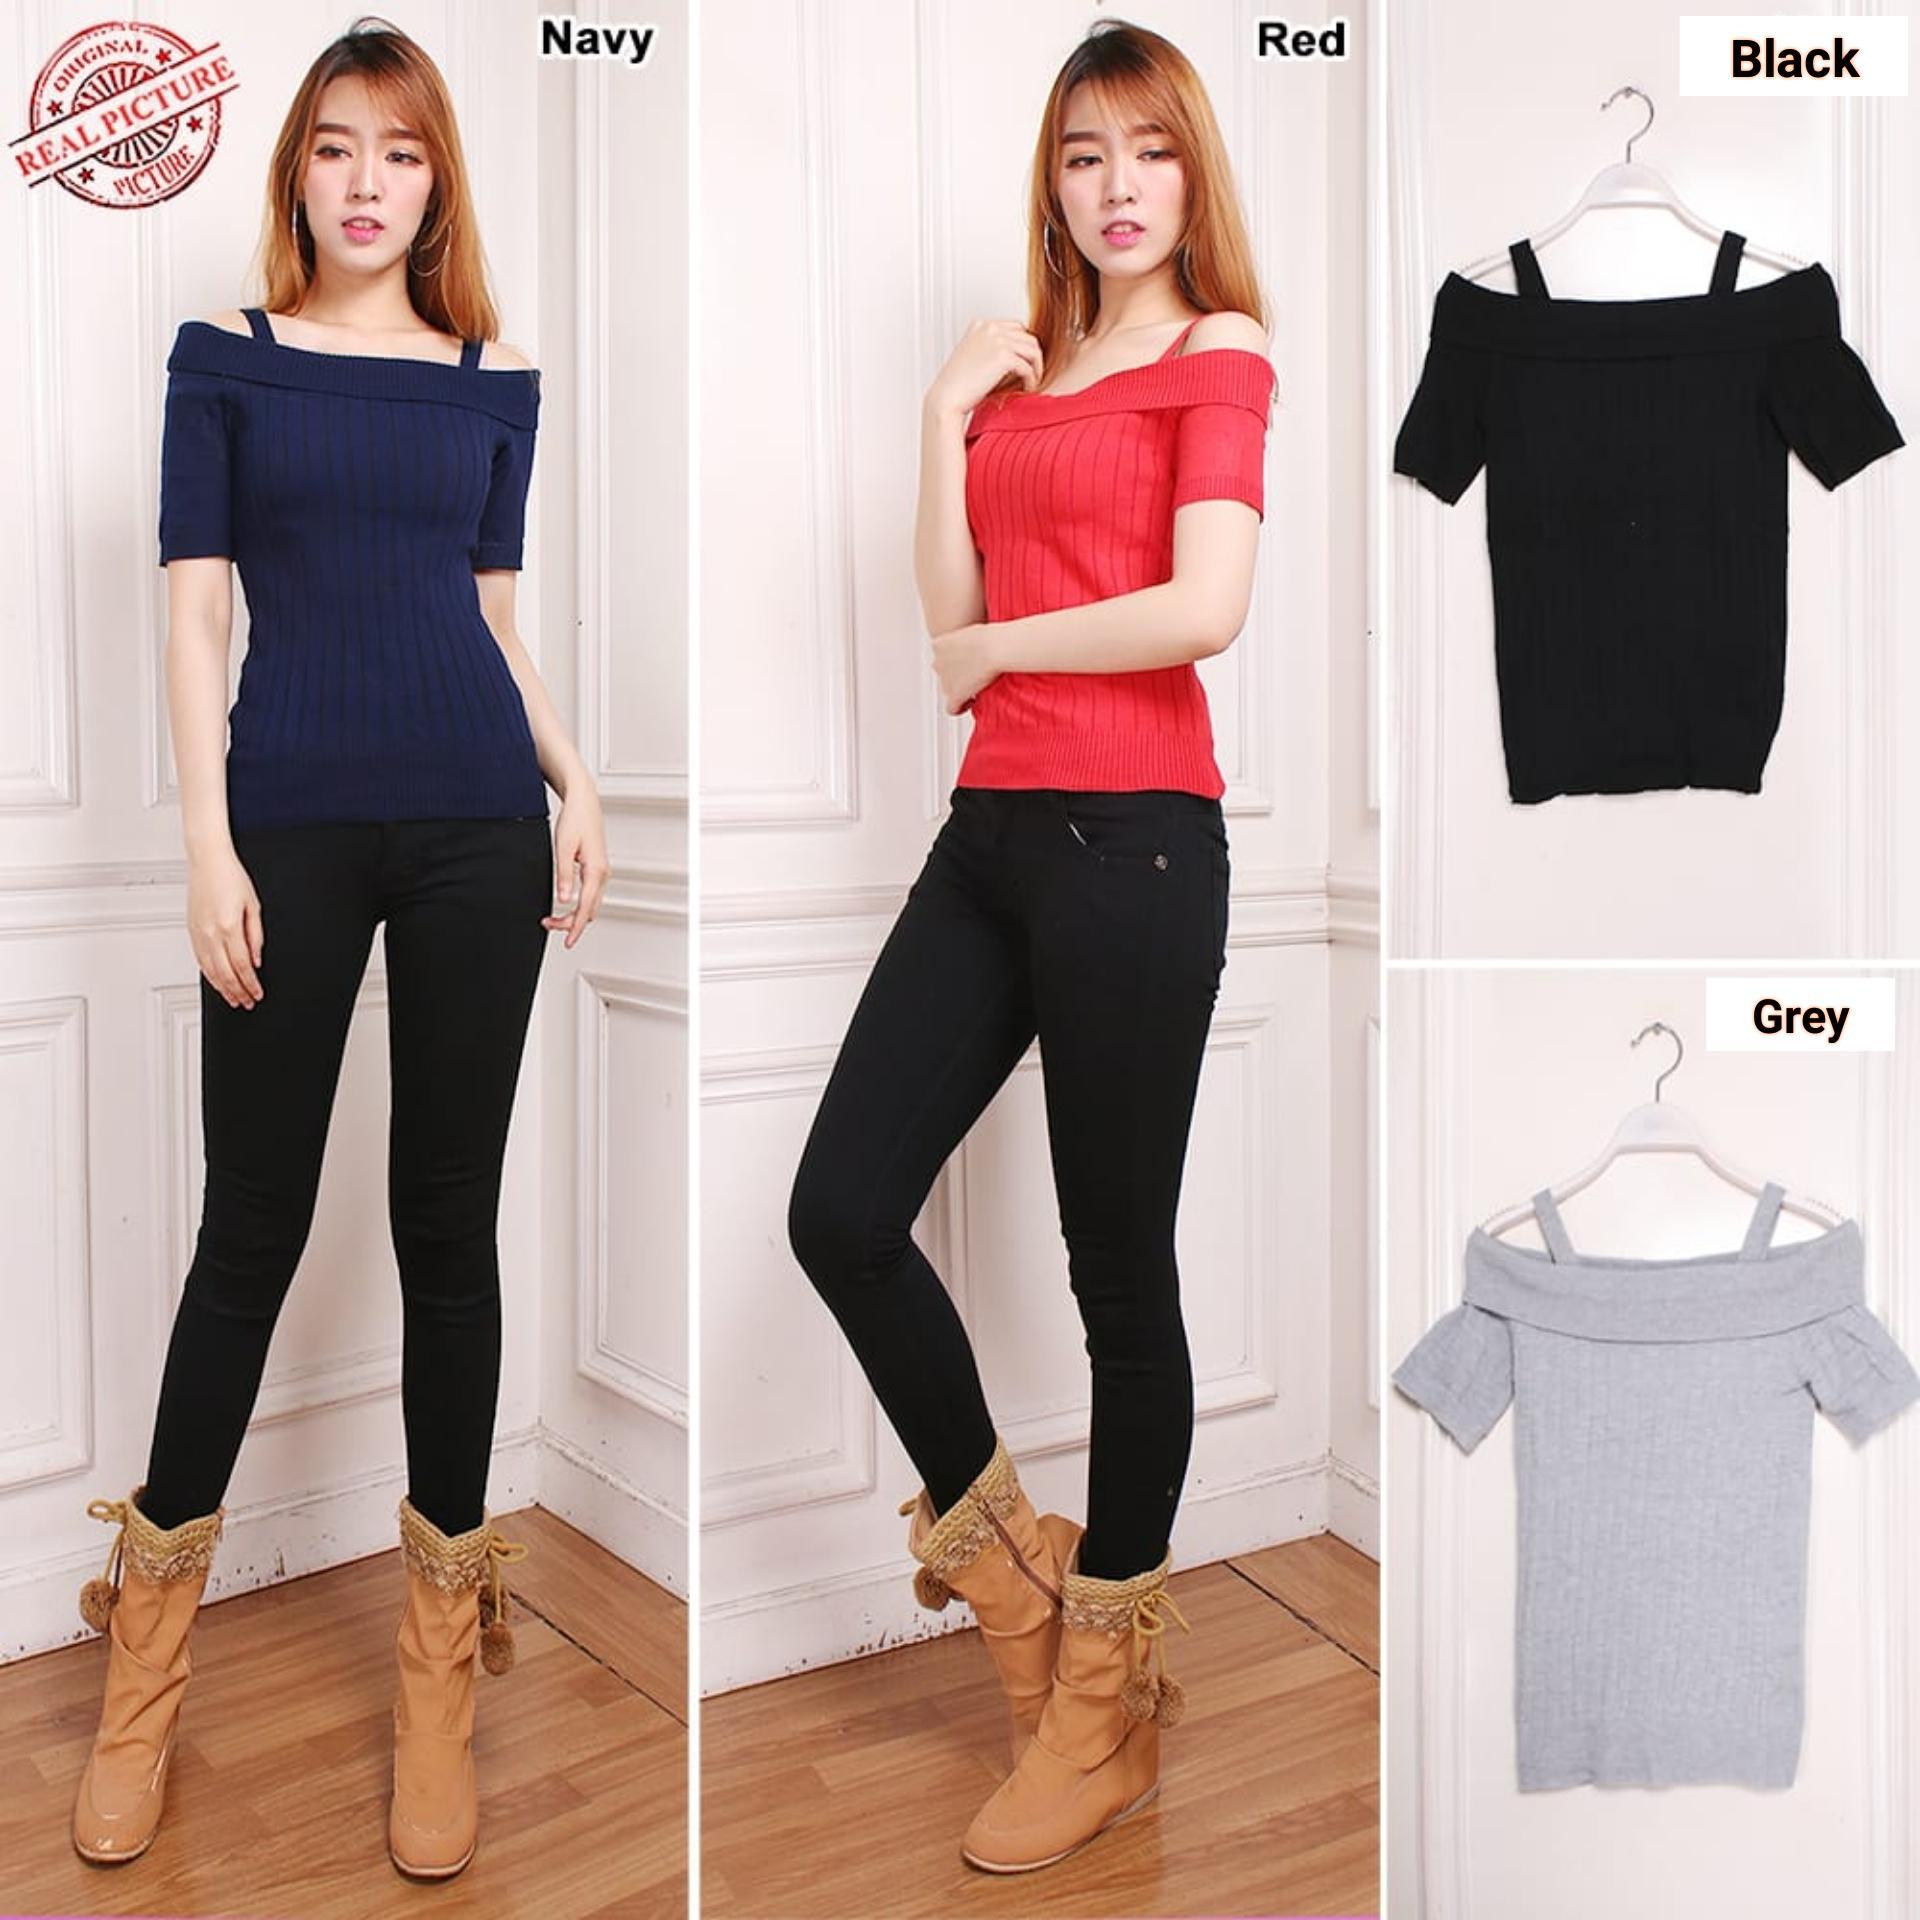 Cj collection Atasan blouse kemeja rajut wanita jumbo blus tshirt knit Anandi / model sabrina